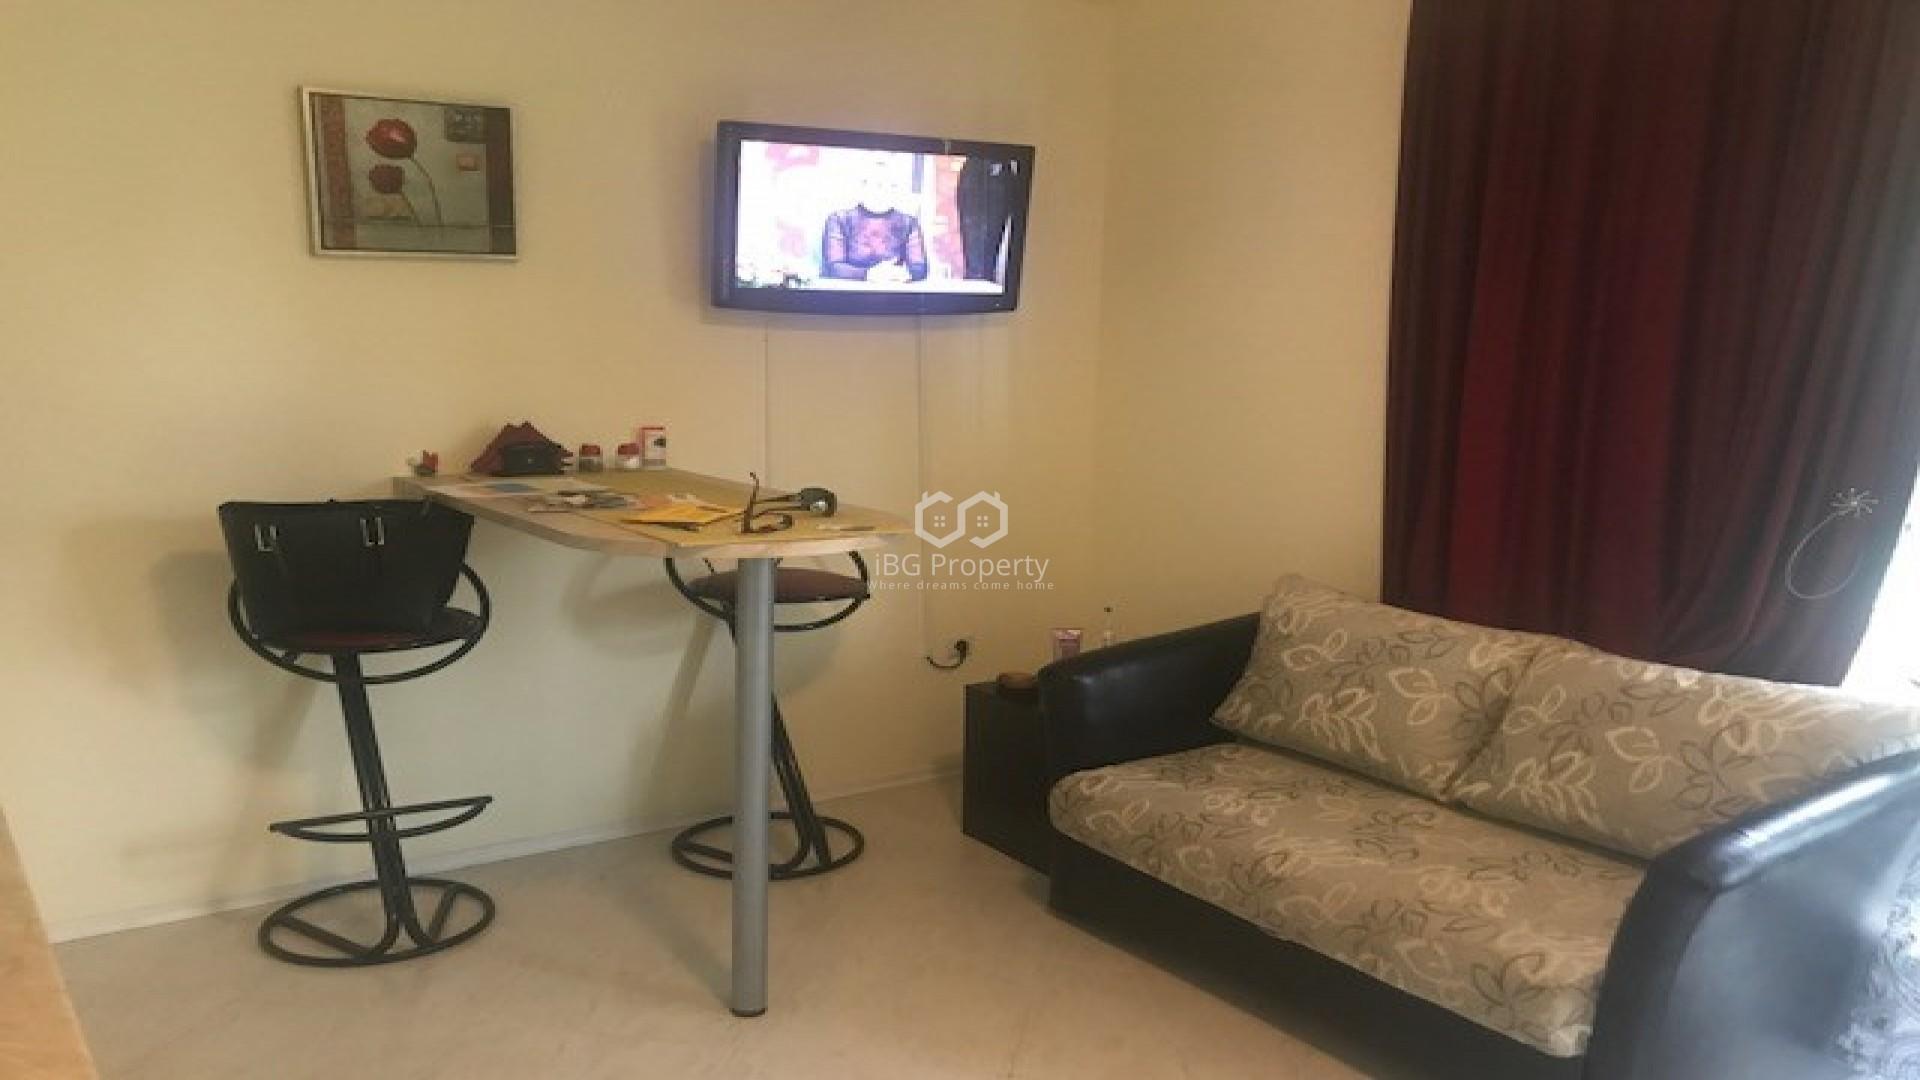 Однокомнатная квартира Равда 26 m2